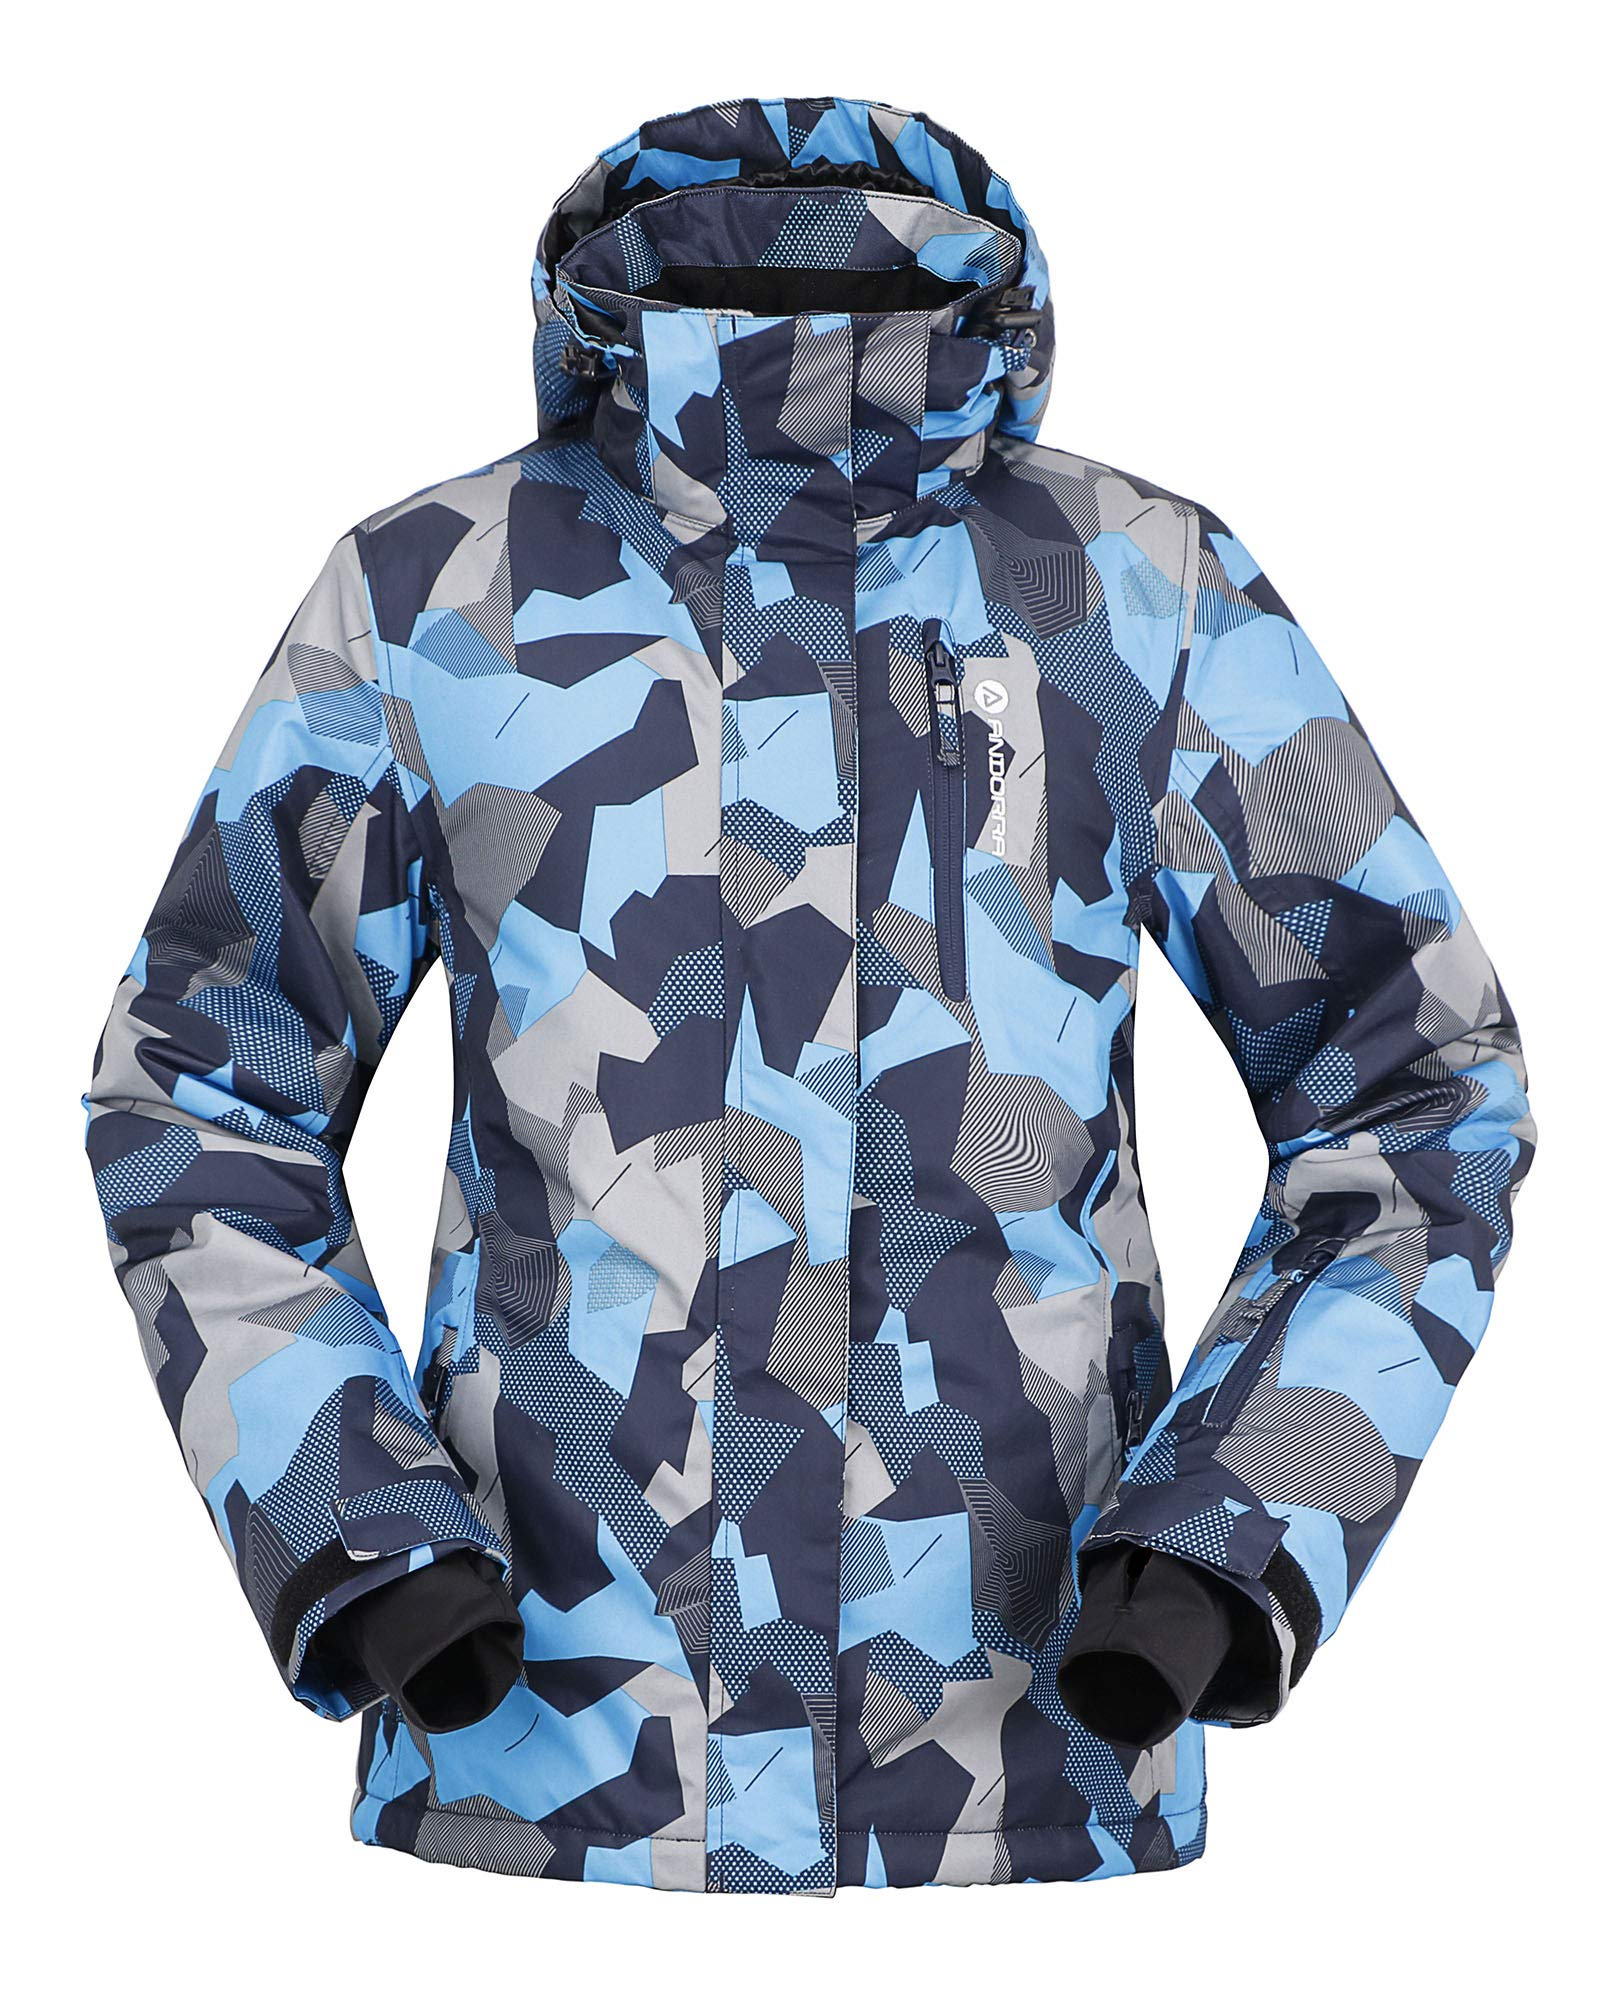 Andorra Snowboarding Jacket Insulated Windproof Mountain Fishing Hiking Coat,Himalayan Shades,L by Andorra